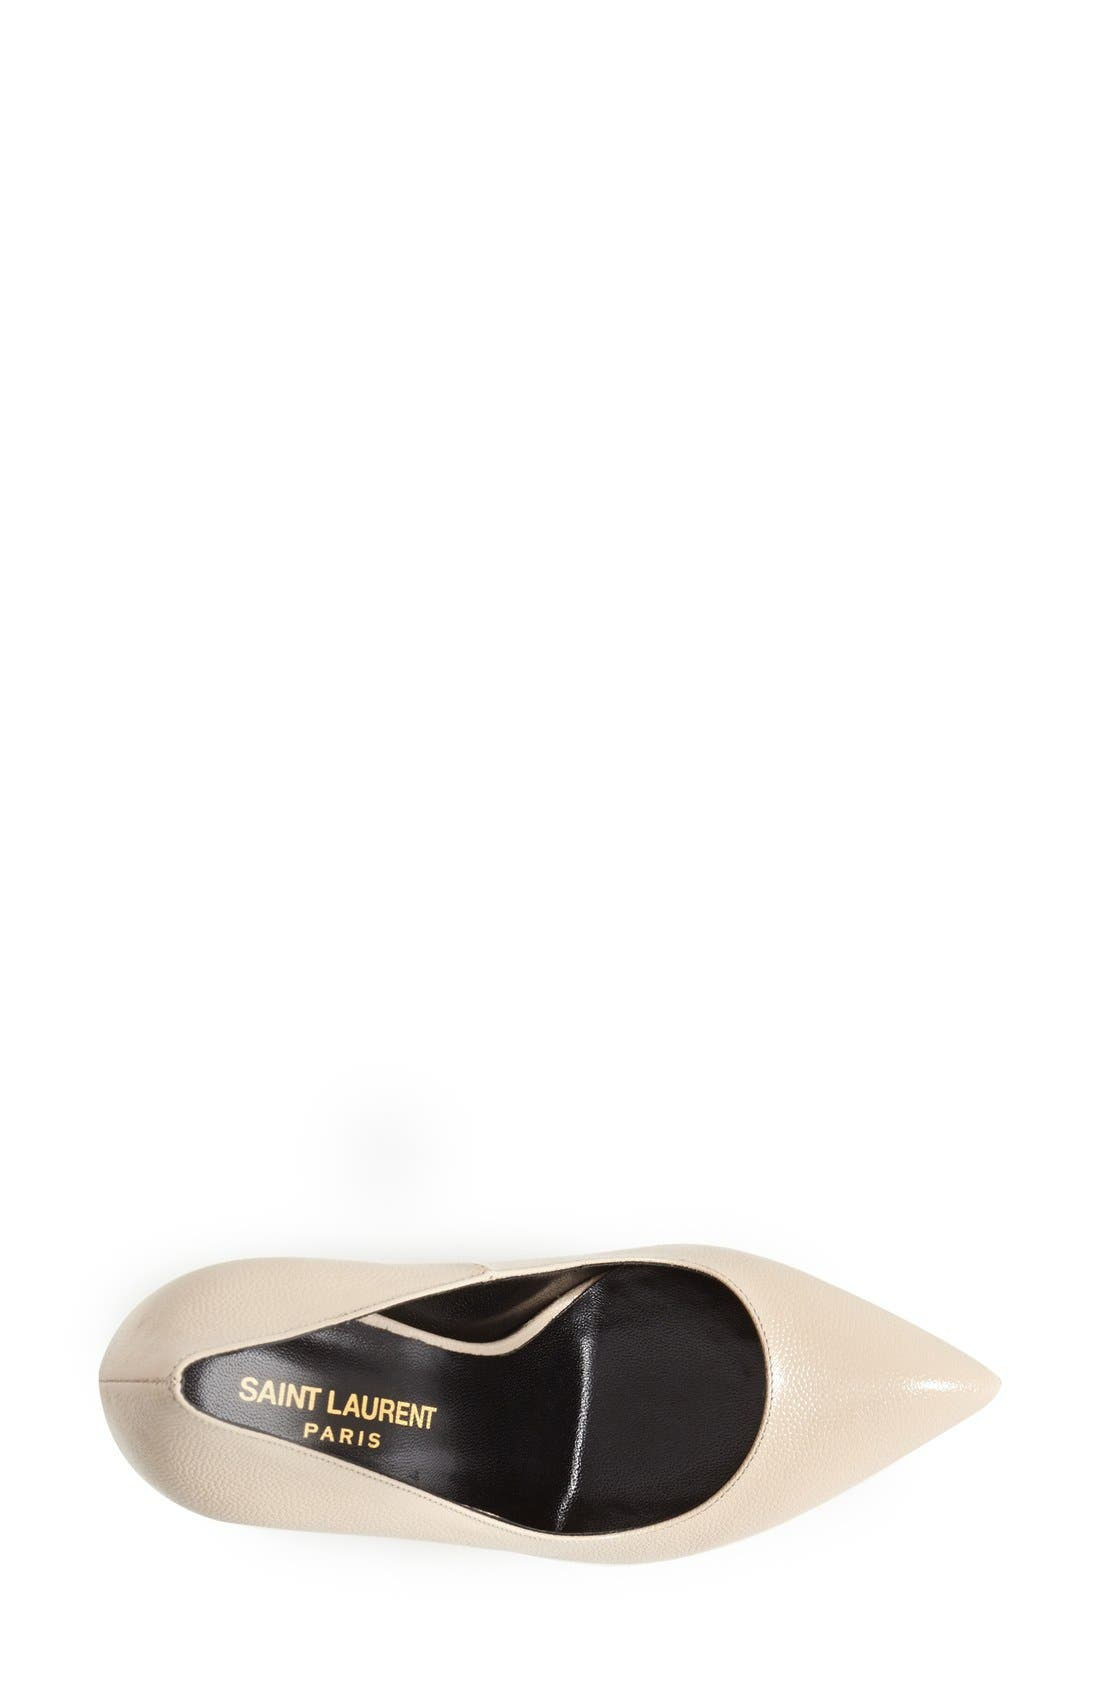 Alternate Image 3  - Saint Laurent 'Janis' Pointy Toe Platform Pump (Women)